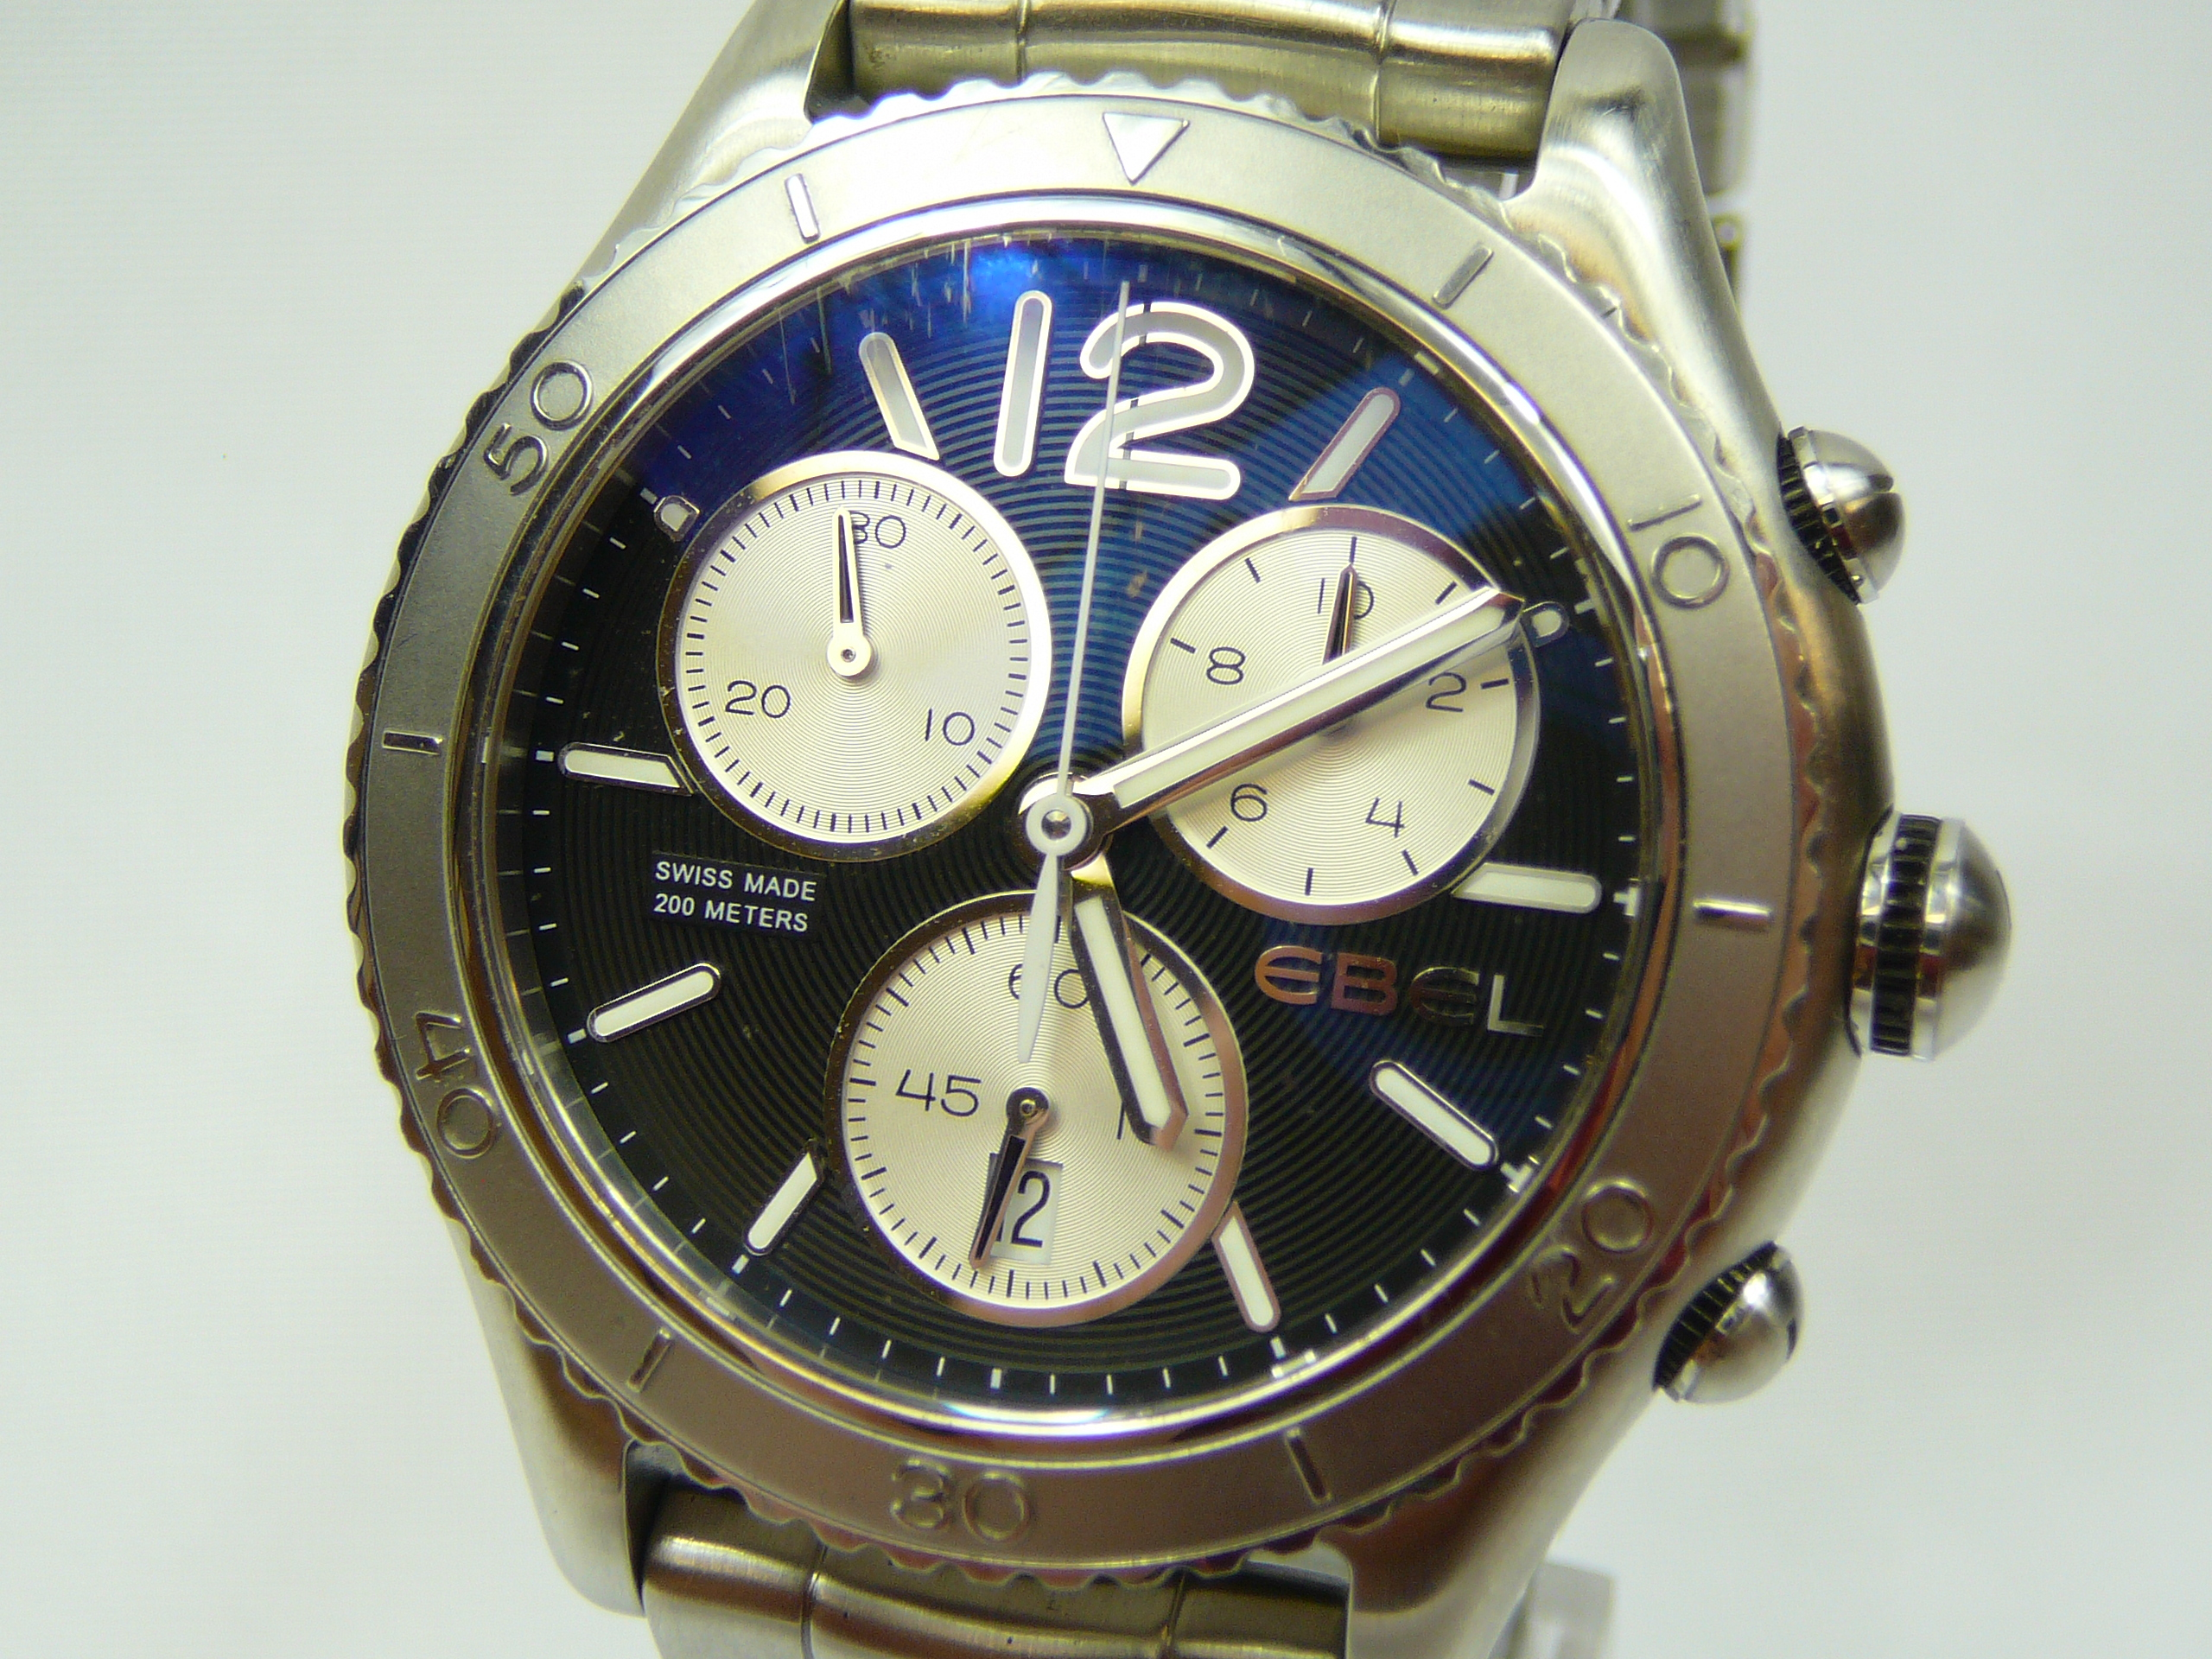 Gents Ebel Wrist Watch - Image 2 of 5